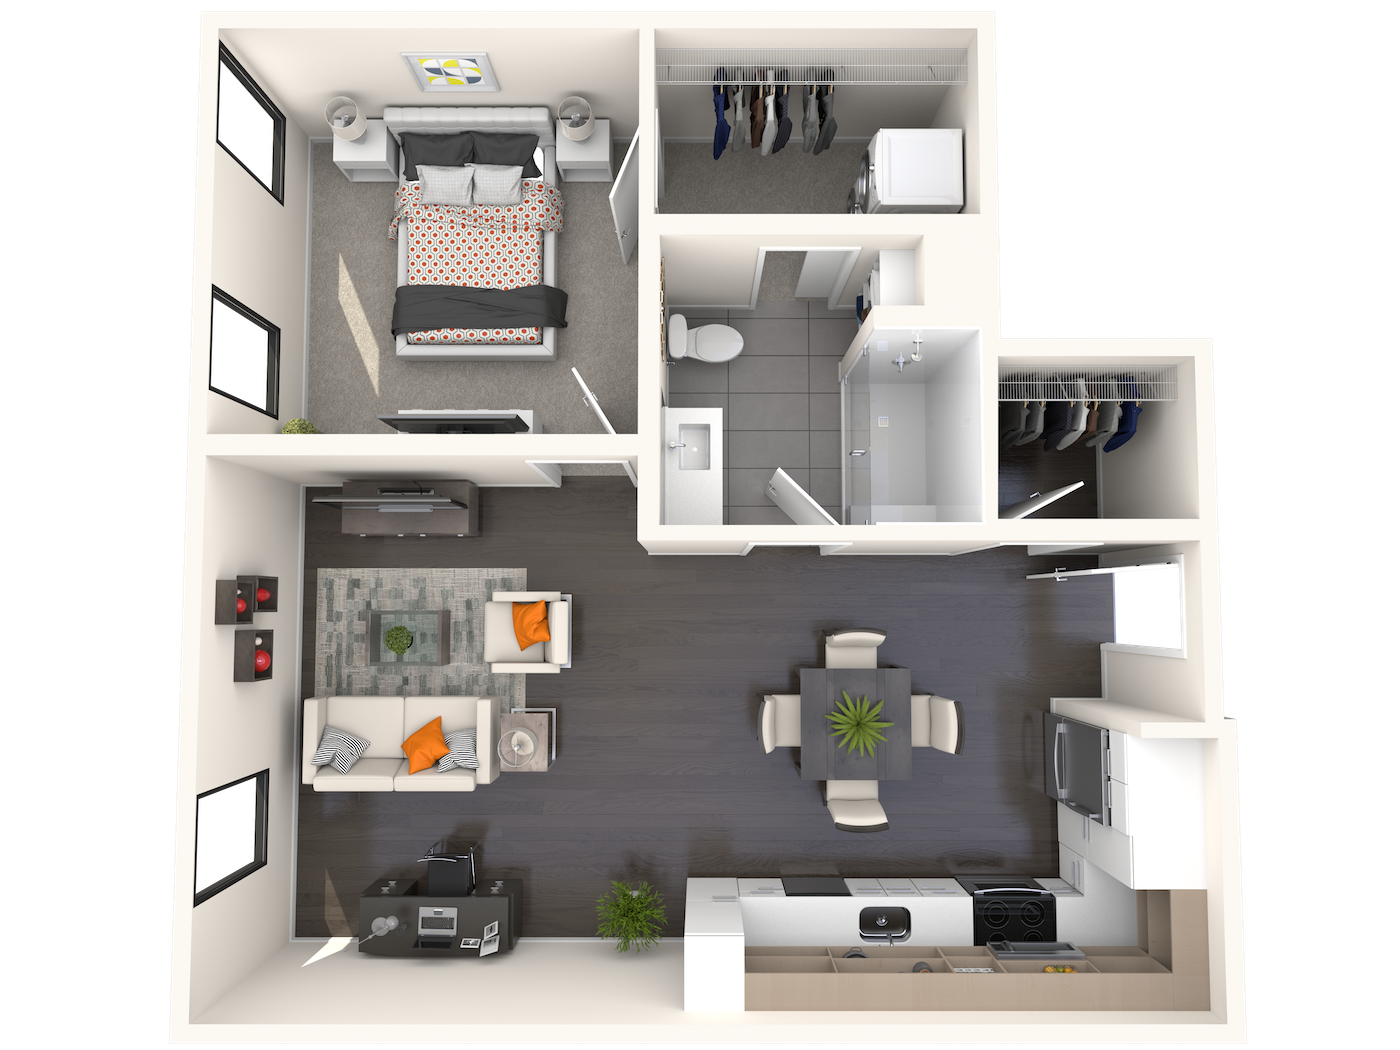 B1.6 Floor Plan